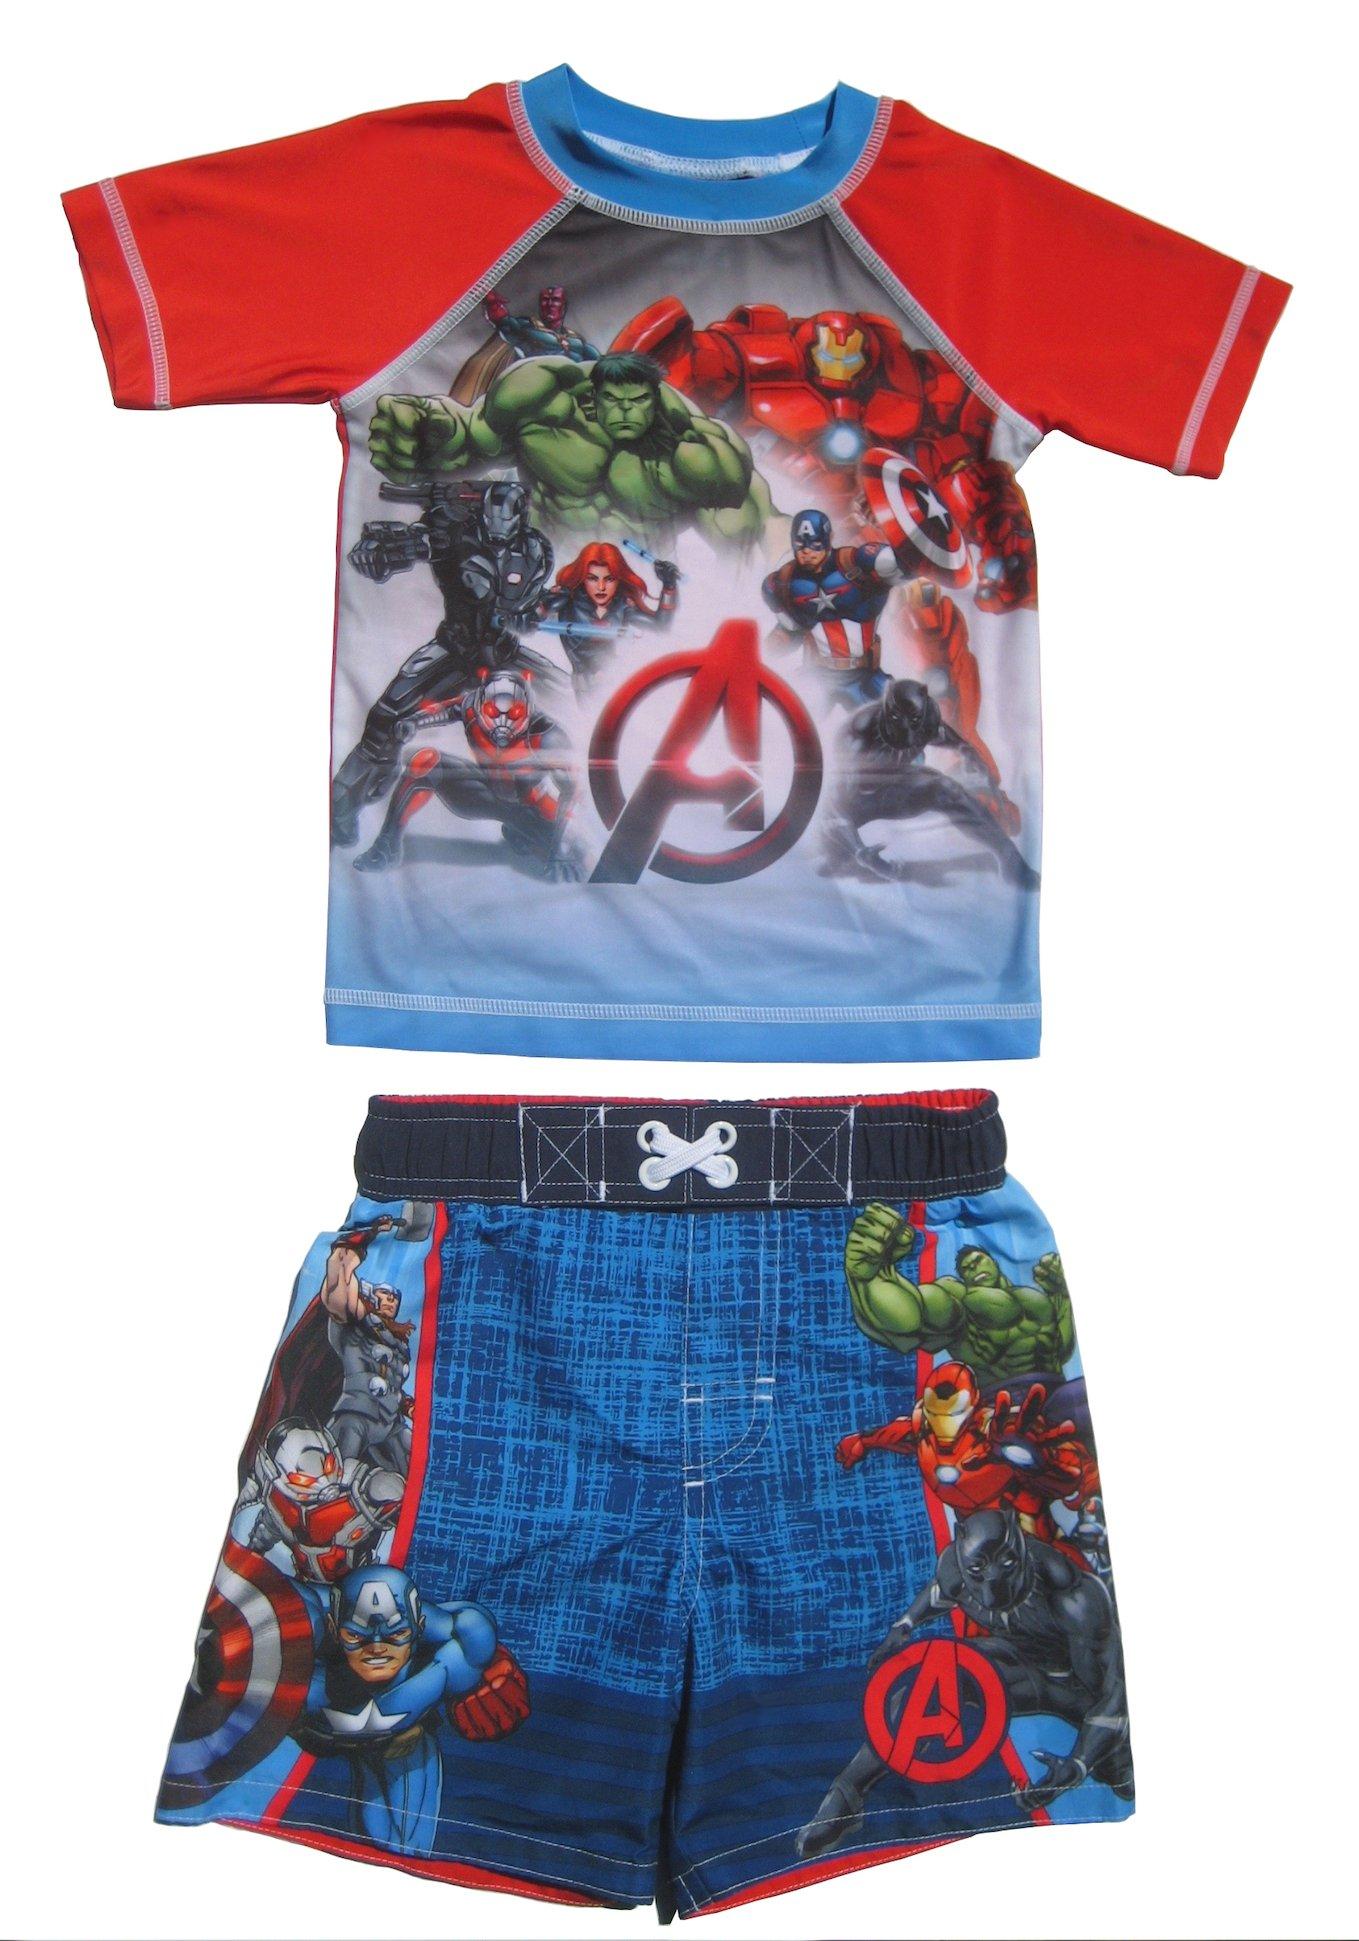 Dreamweave Boys Rash Guard Set (Avengers, 4T)